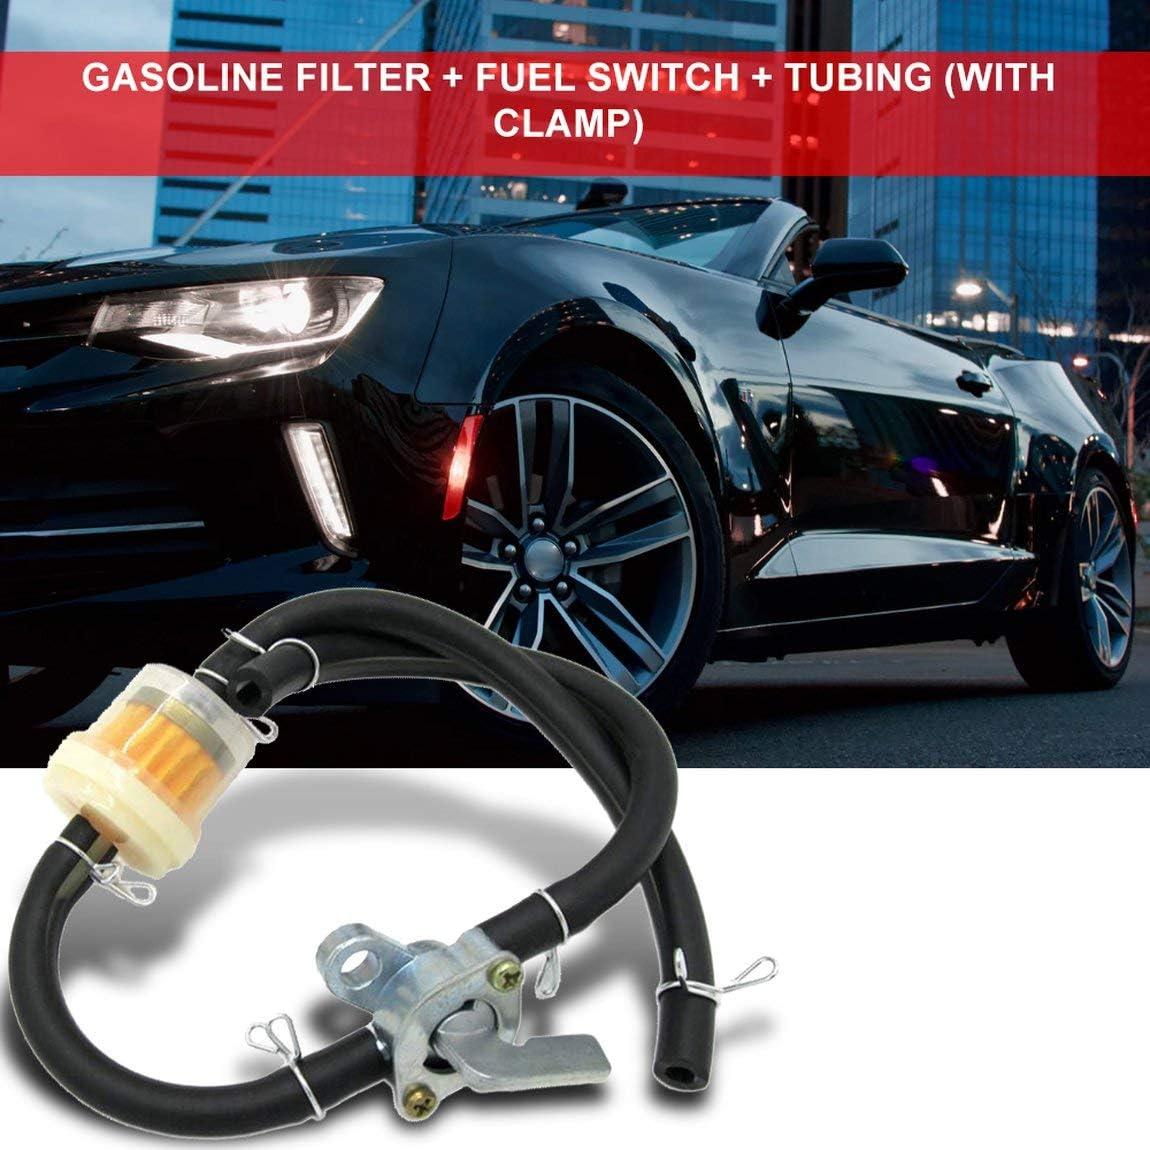 SeniorMar N/ützliche universelle Kraftstoffhahn Benzinschalter Kraftstoffhahn Benzinhahn Wasserhahn f/ür Generator Gas Motor Kraftstofftanks